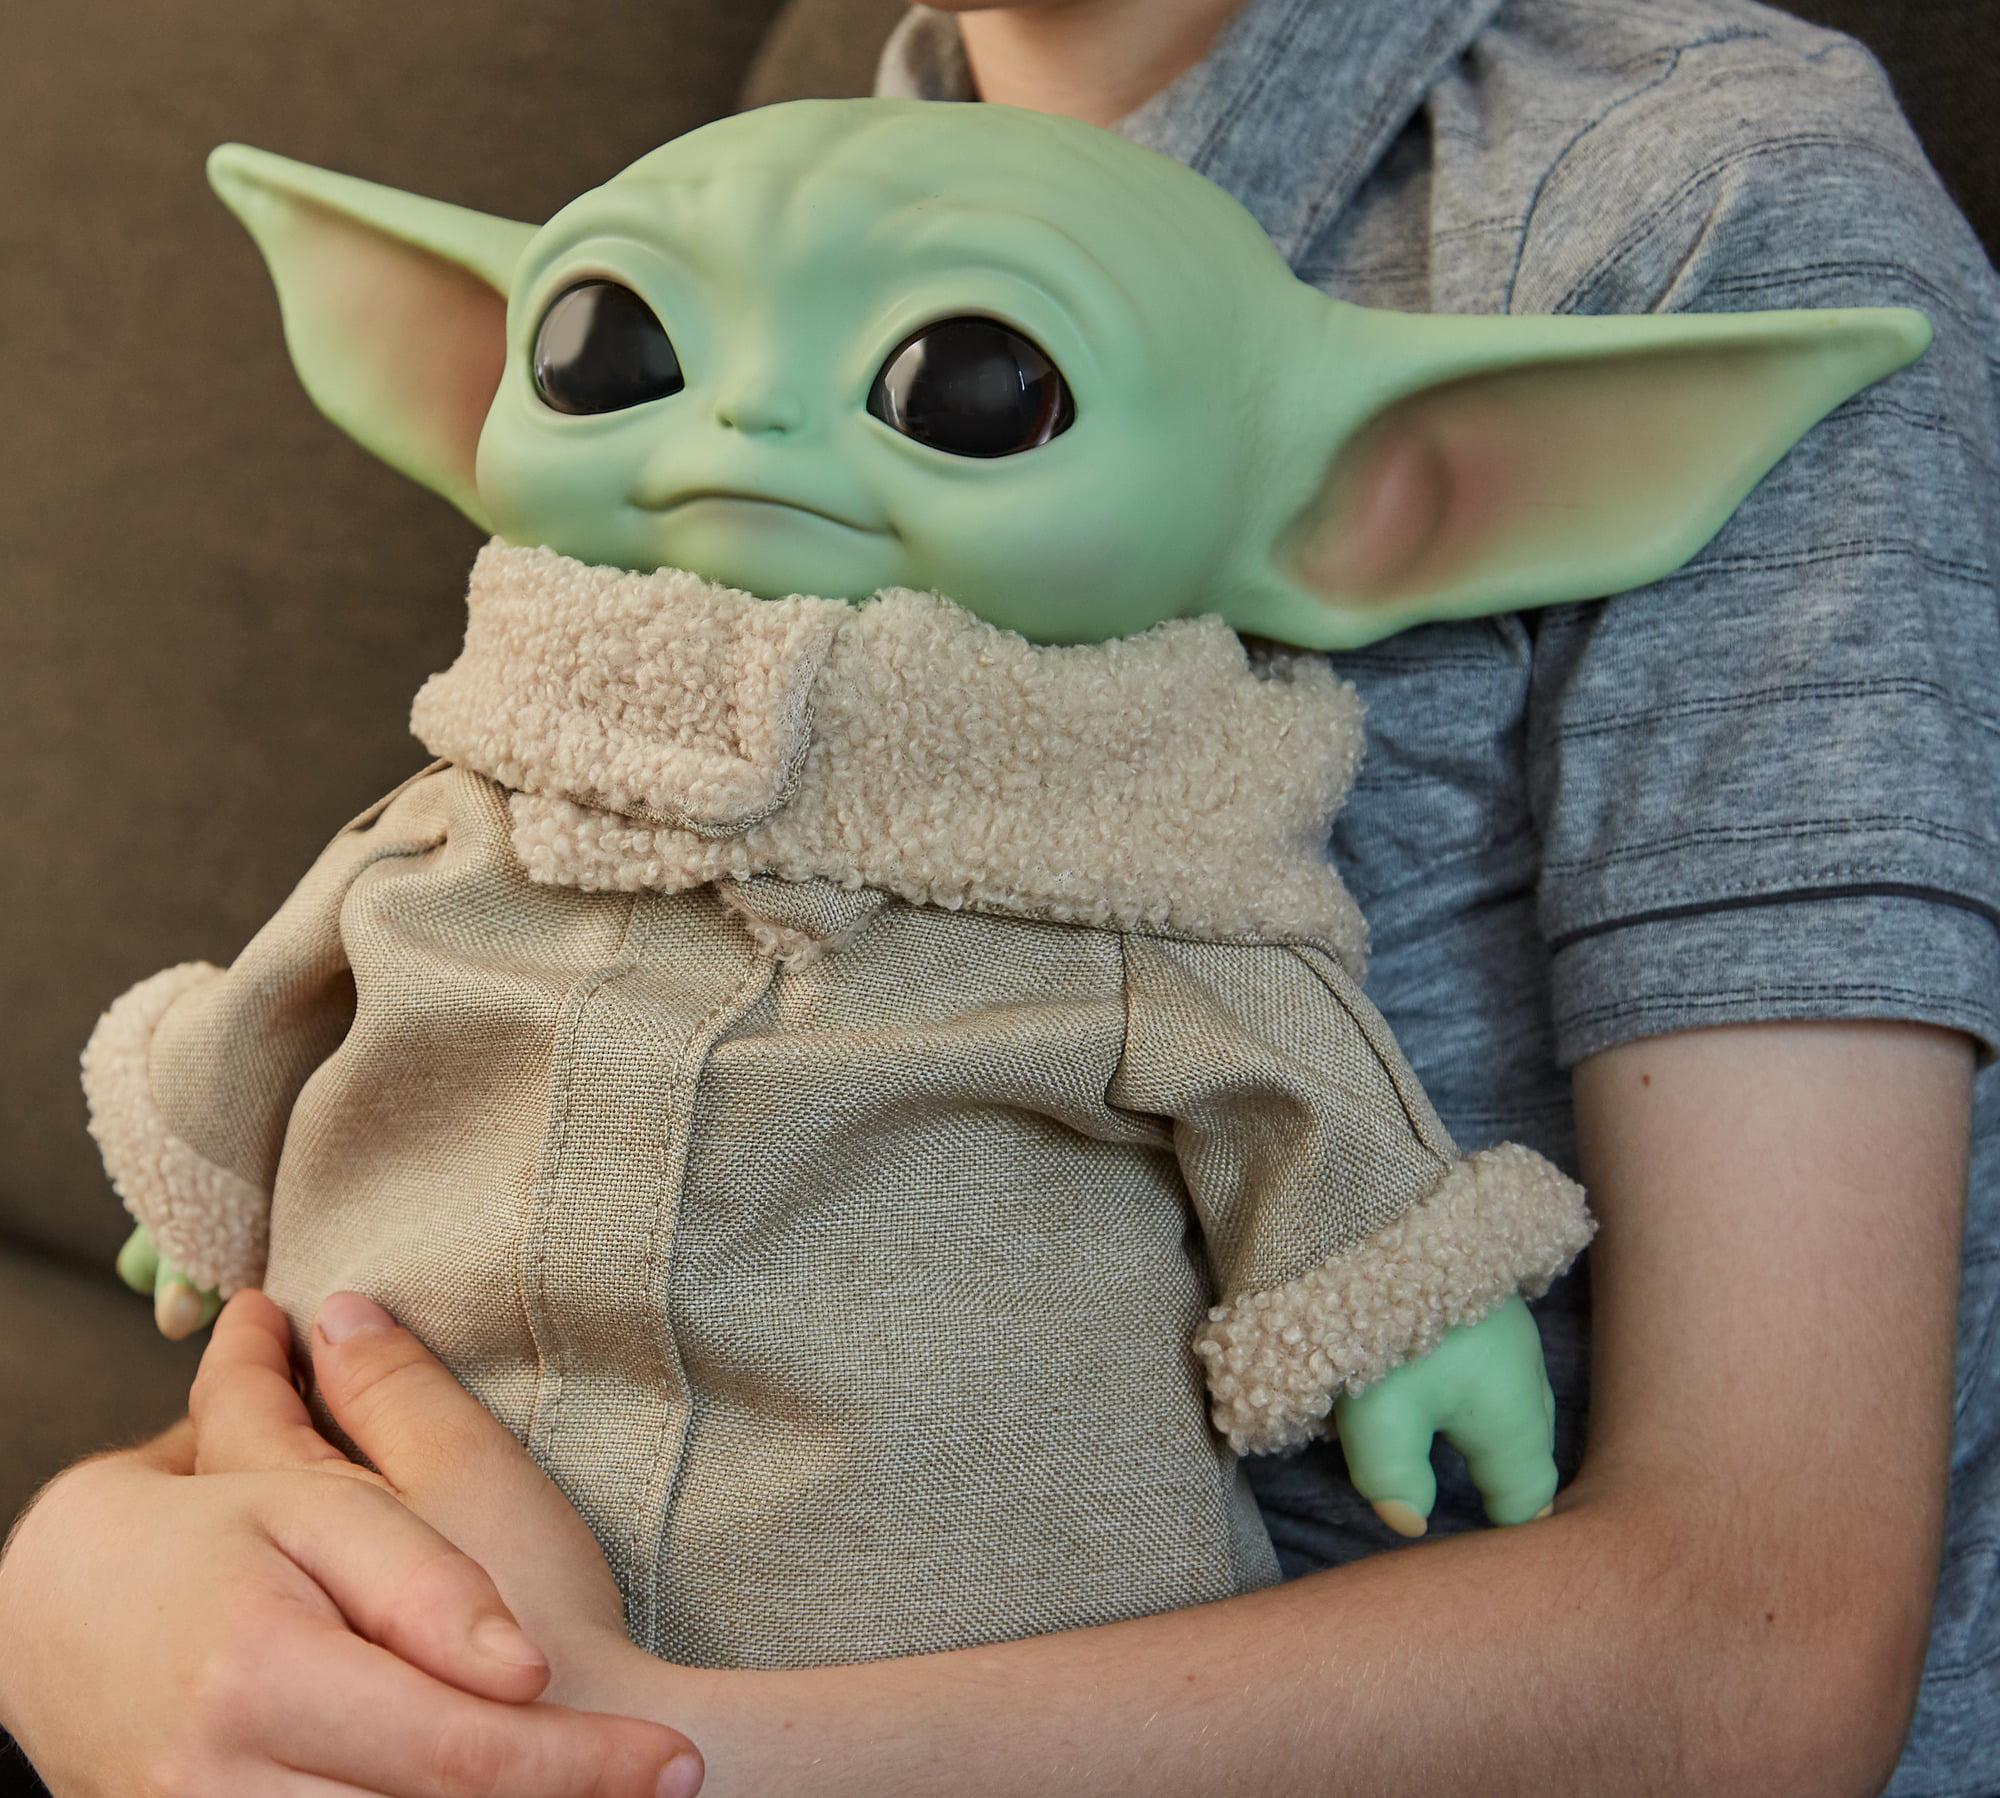 Star Wars Mandalorian The Child 11 inch Plush Toy Doll Baby Yoda Quick Ship!